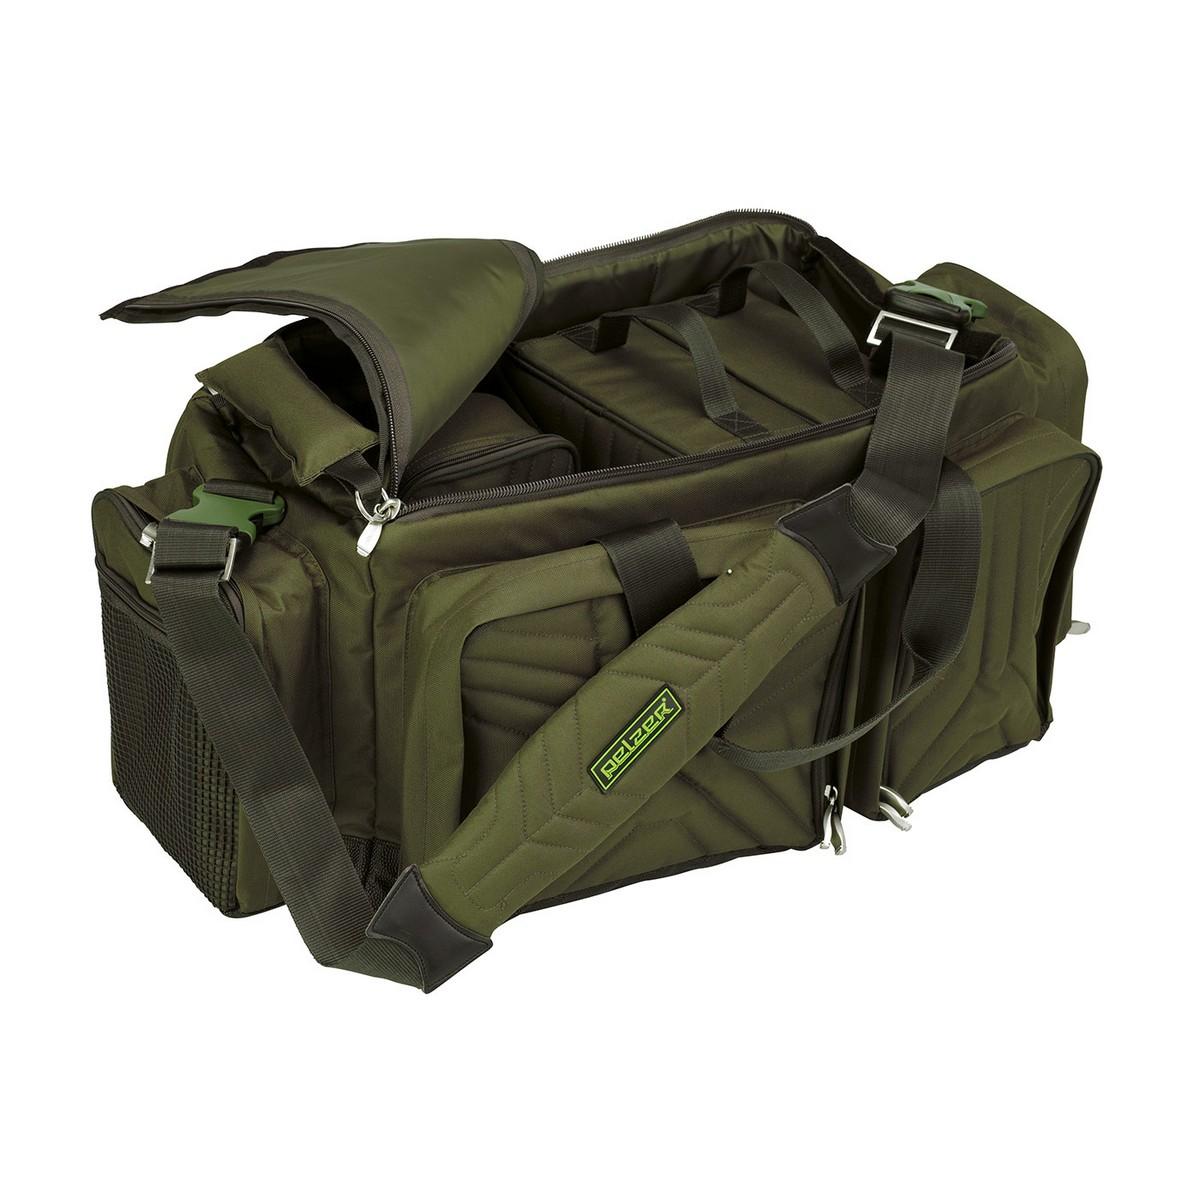 Сак рибарски Pelzer Executive Carp System Bag